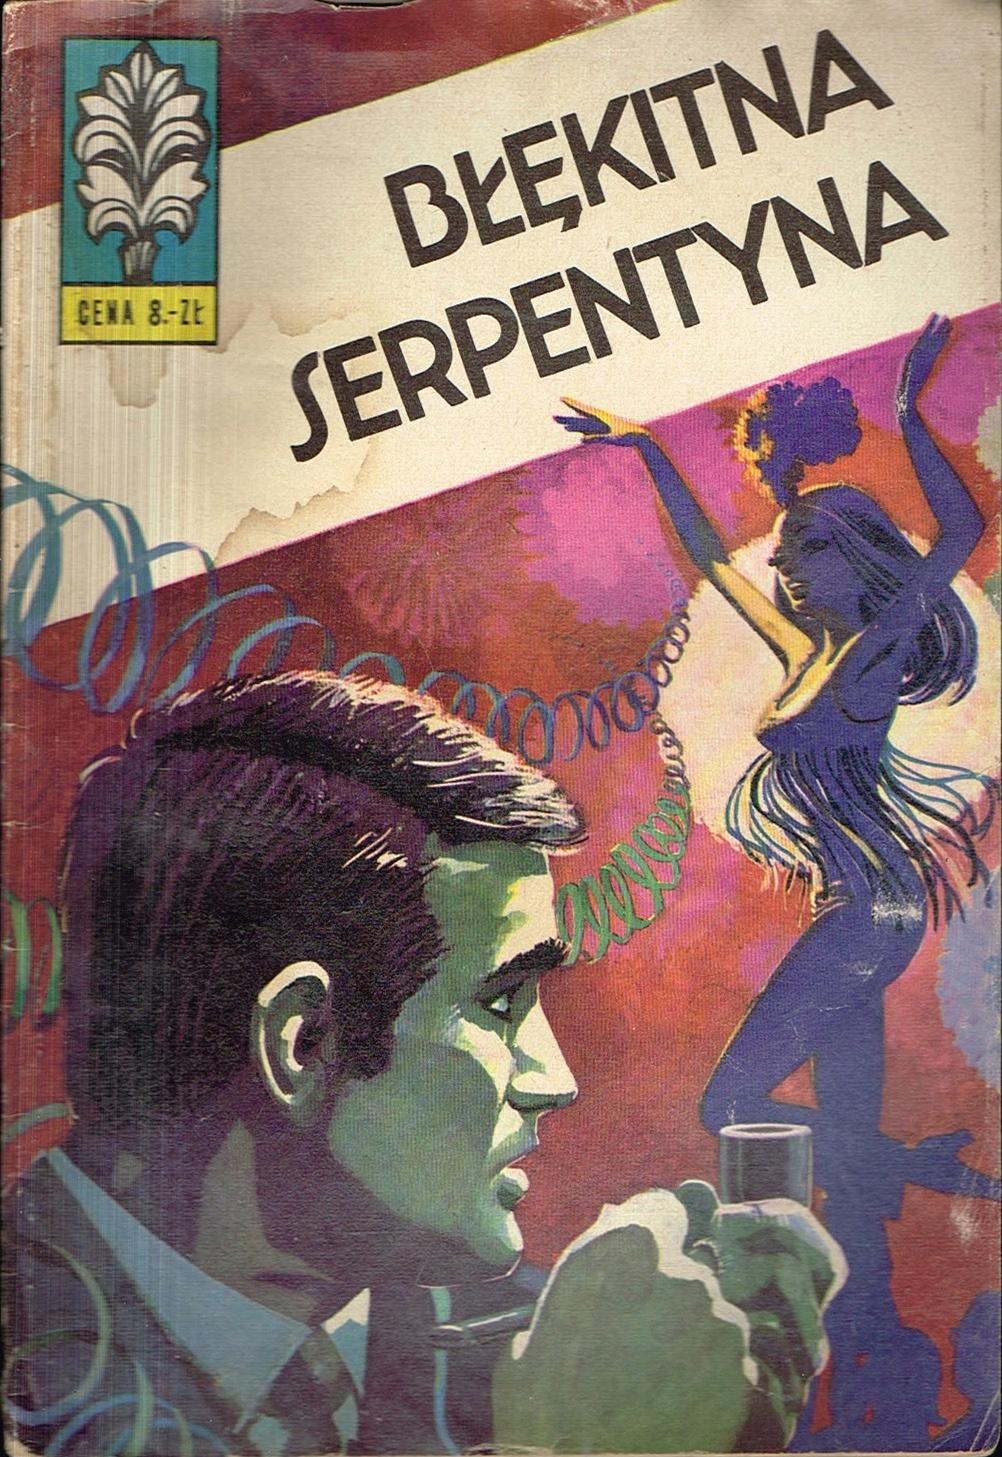 KAPITAN ŻBIK 14 Błękitna serpentyna [wyd. 2 1974]